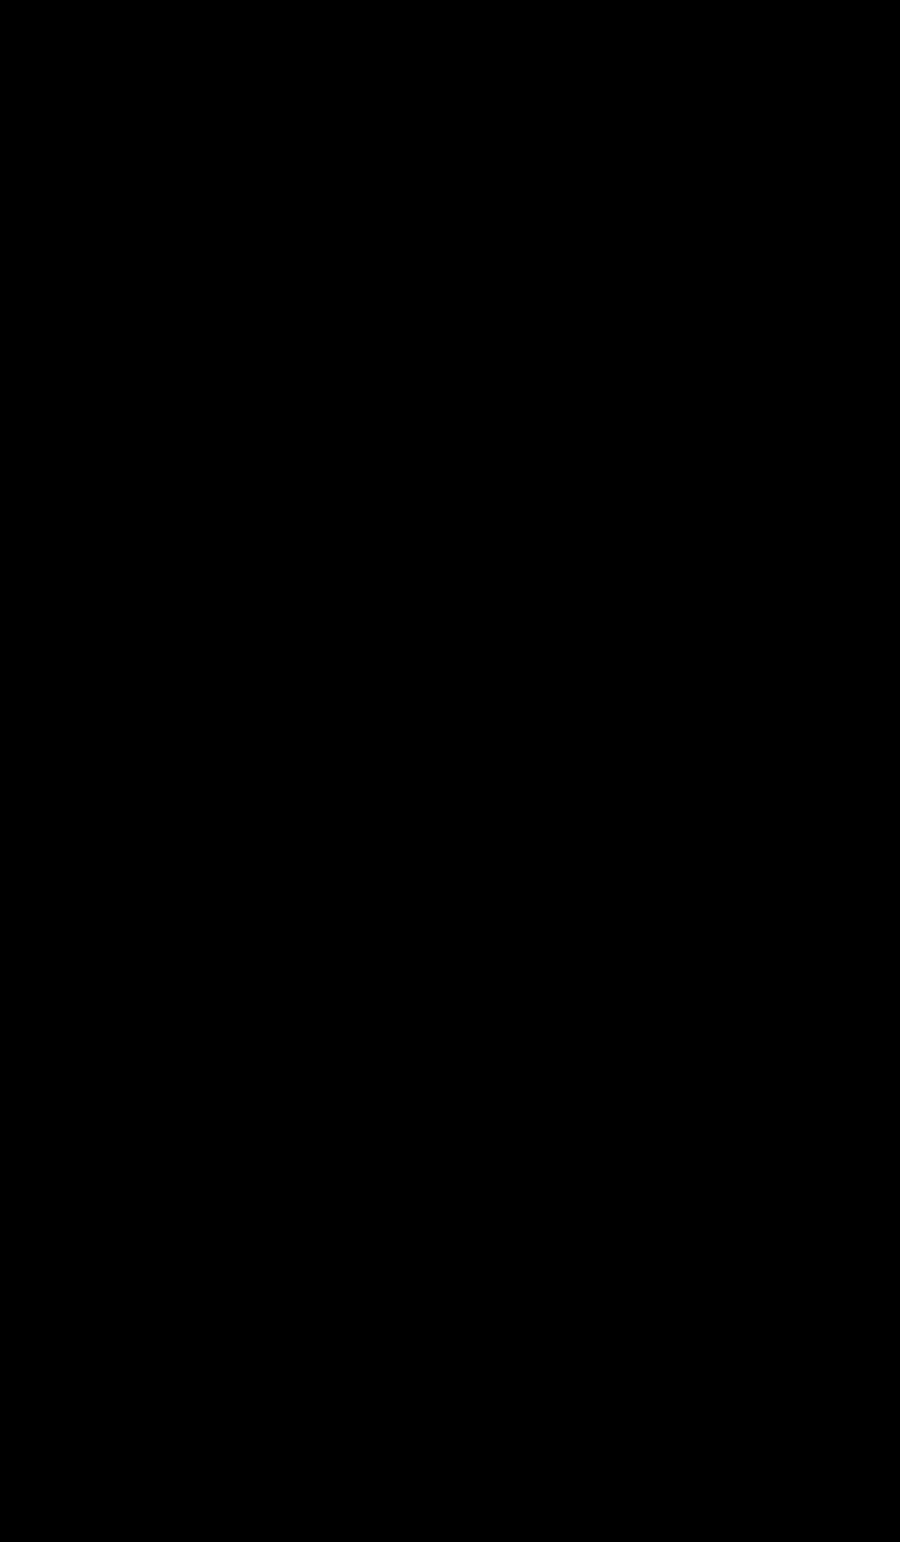 vector black and white stock drawing chibis vegeta #93820467